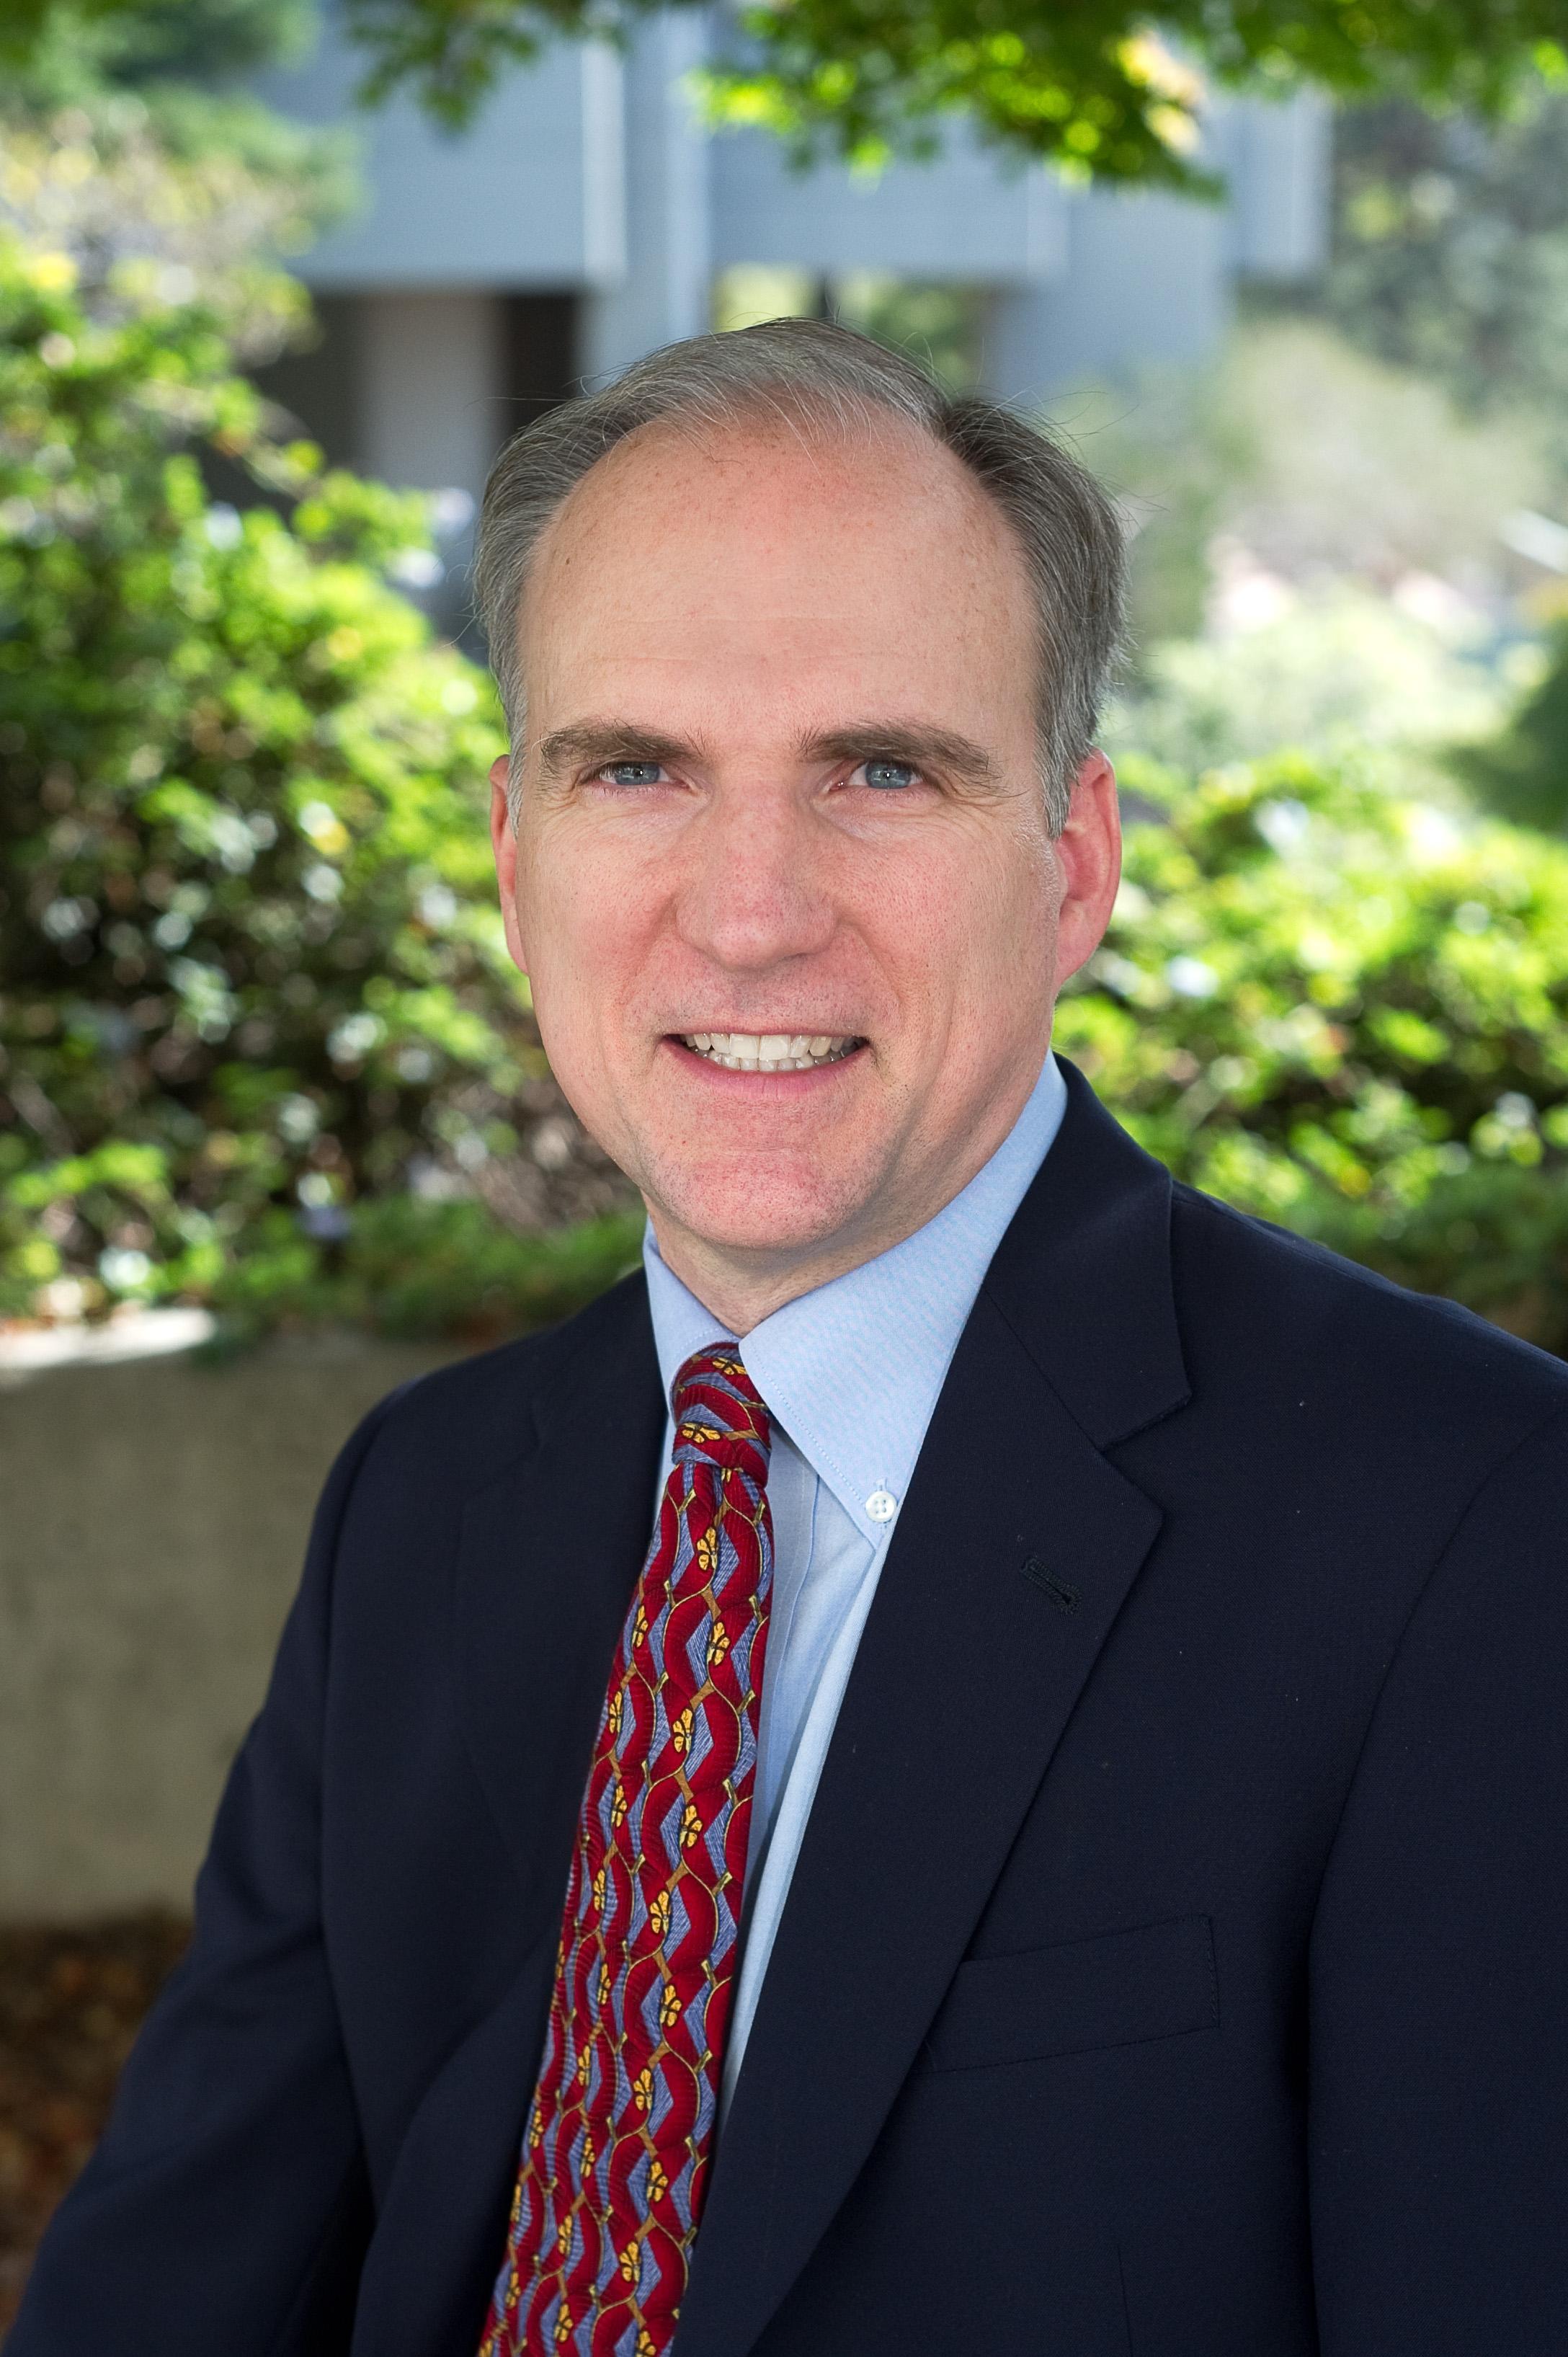 David Romer